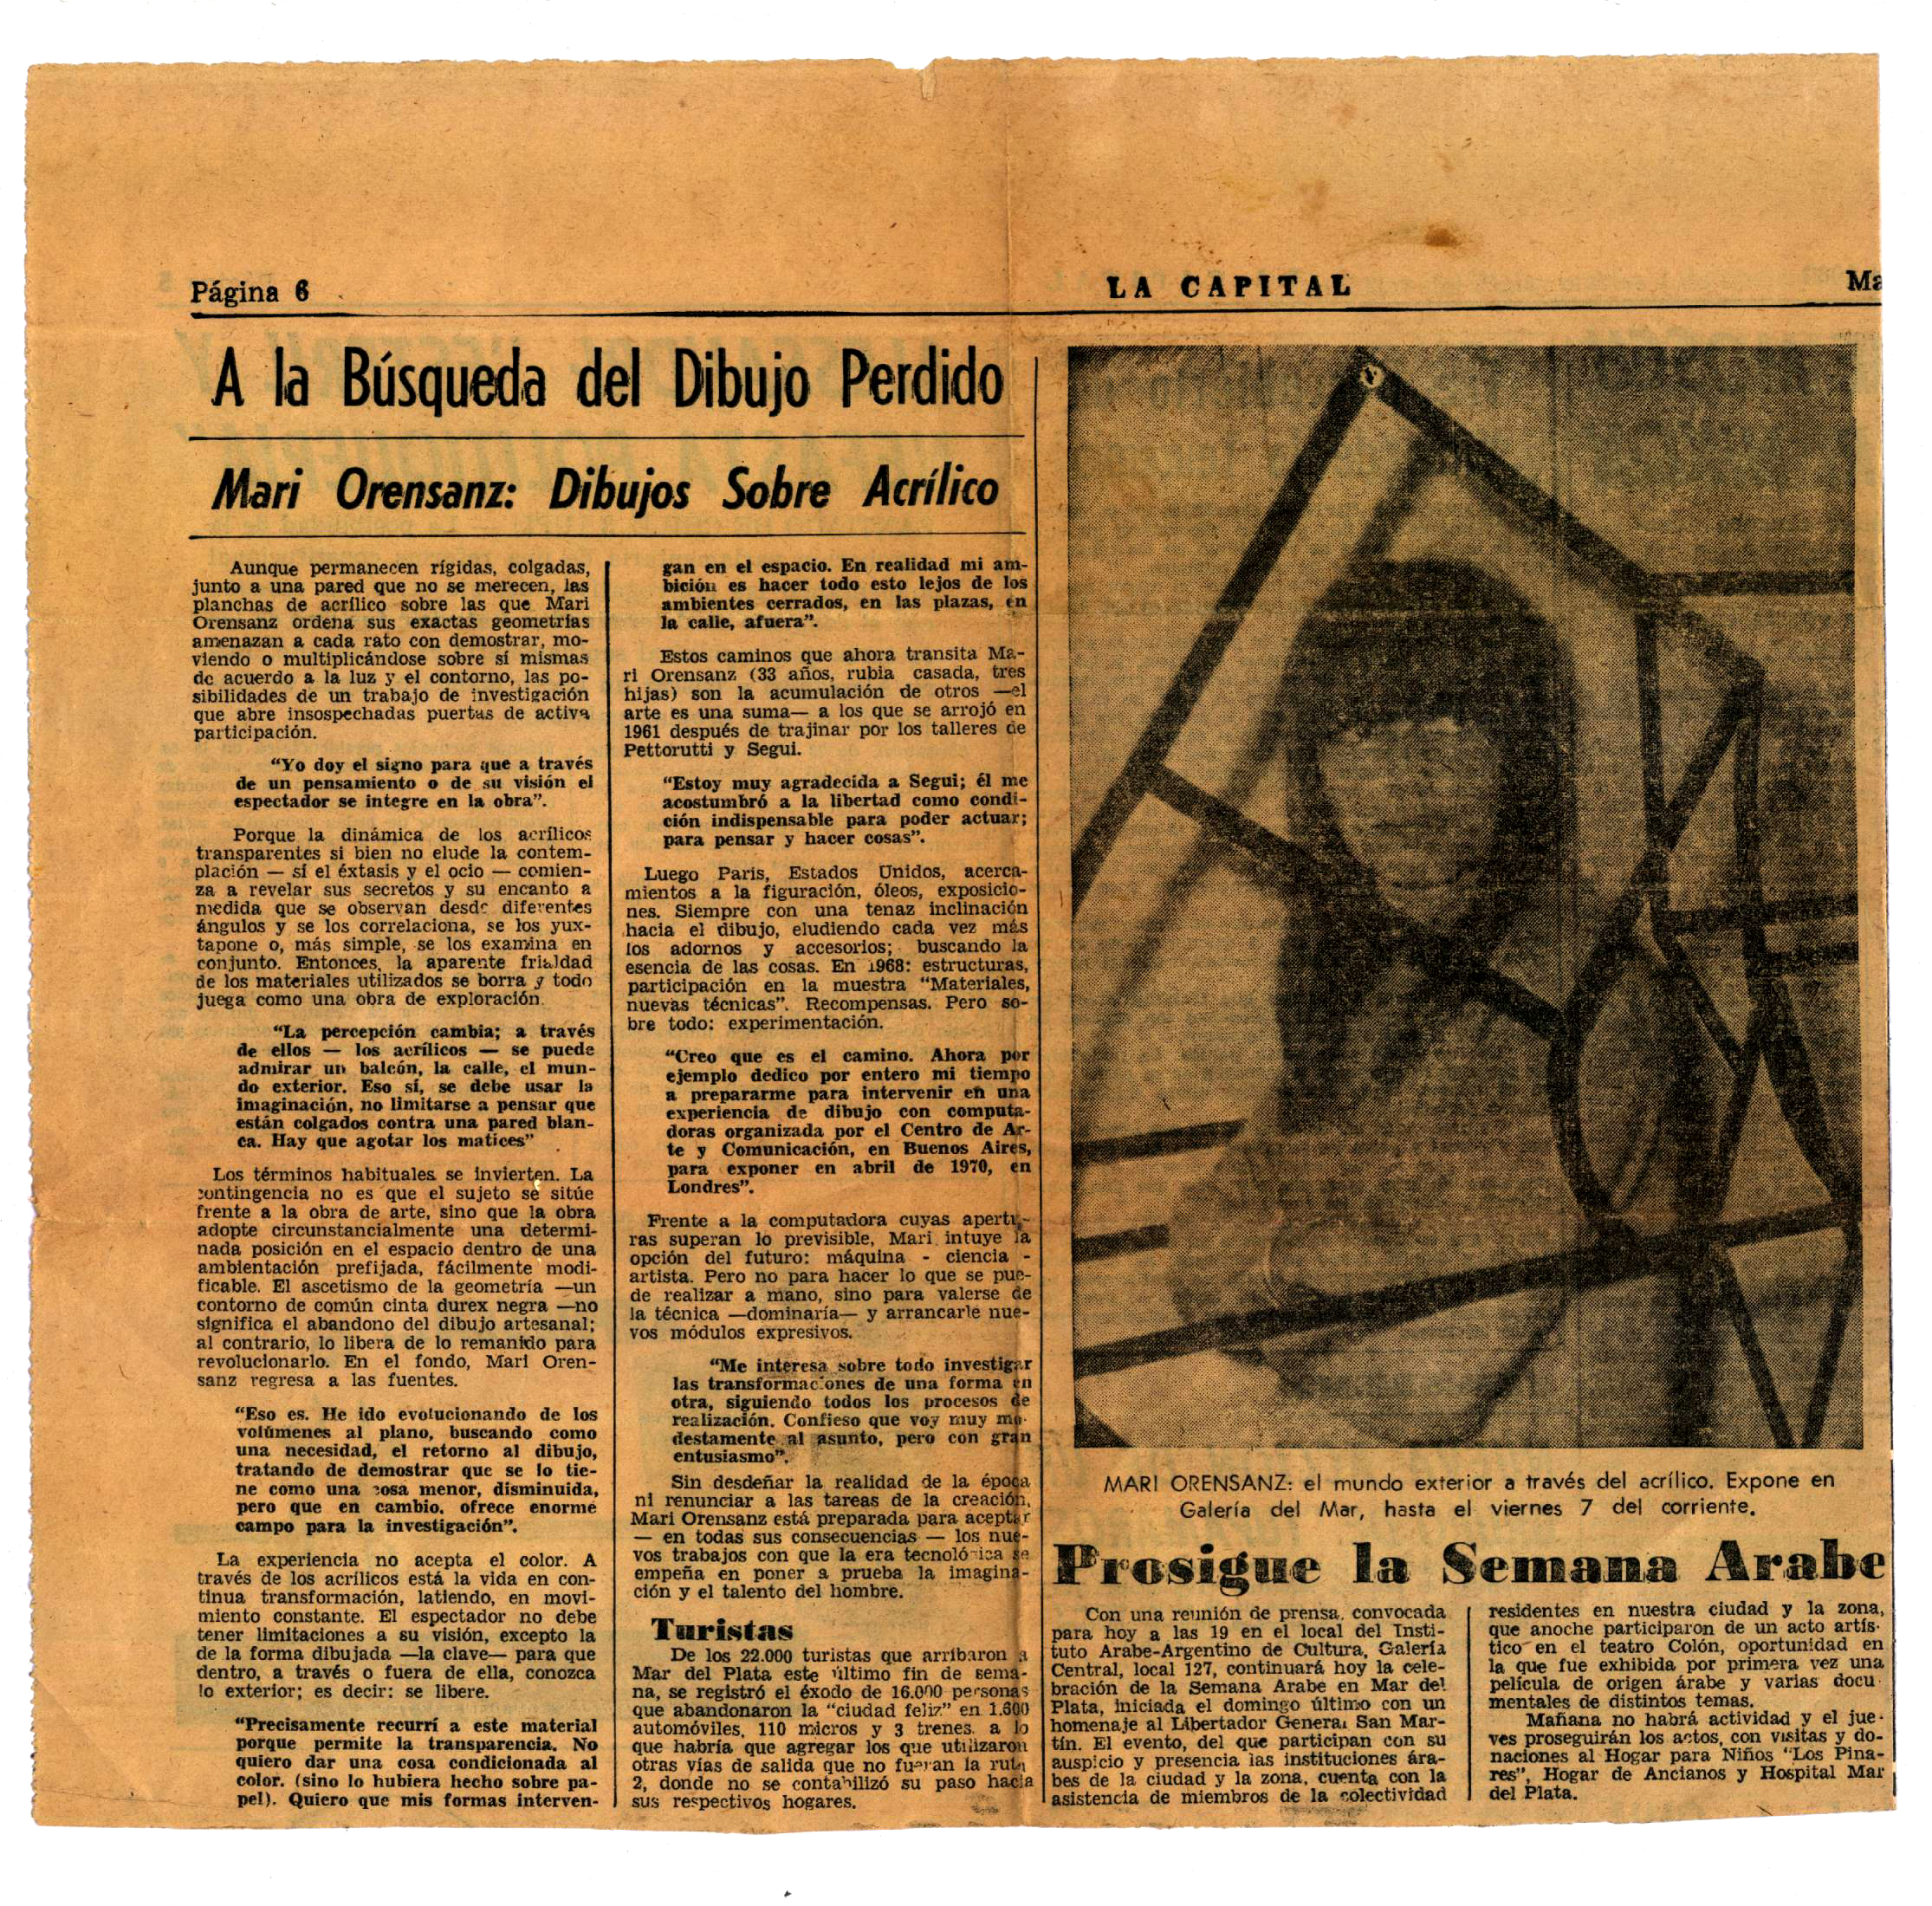 Diario La Capital - 1969